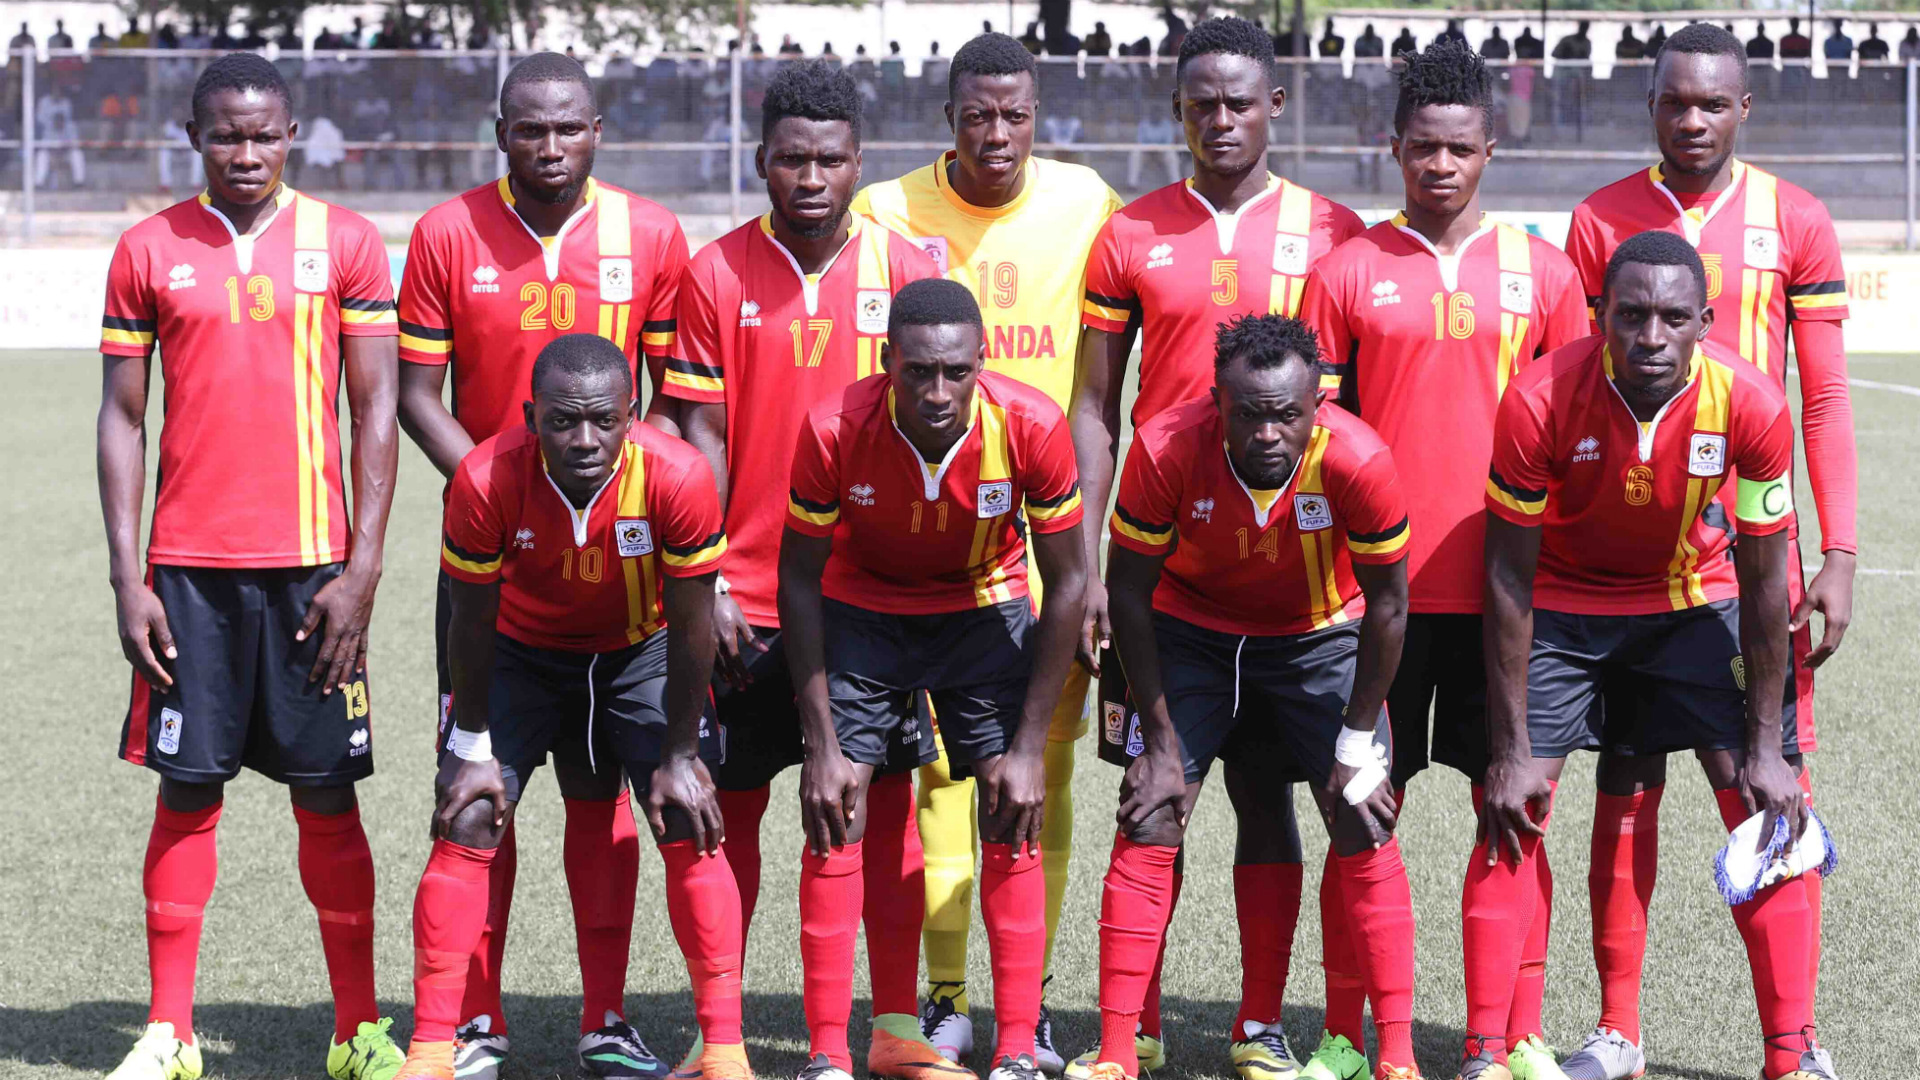 Football: Uganda team leaves for Nigeria for friendly match